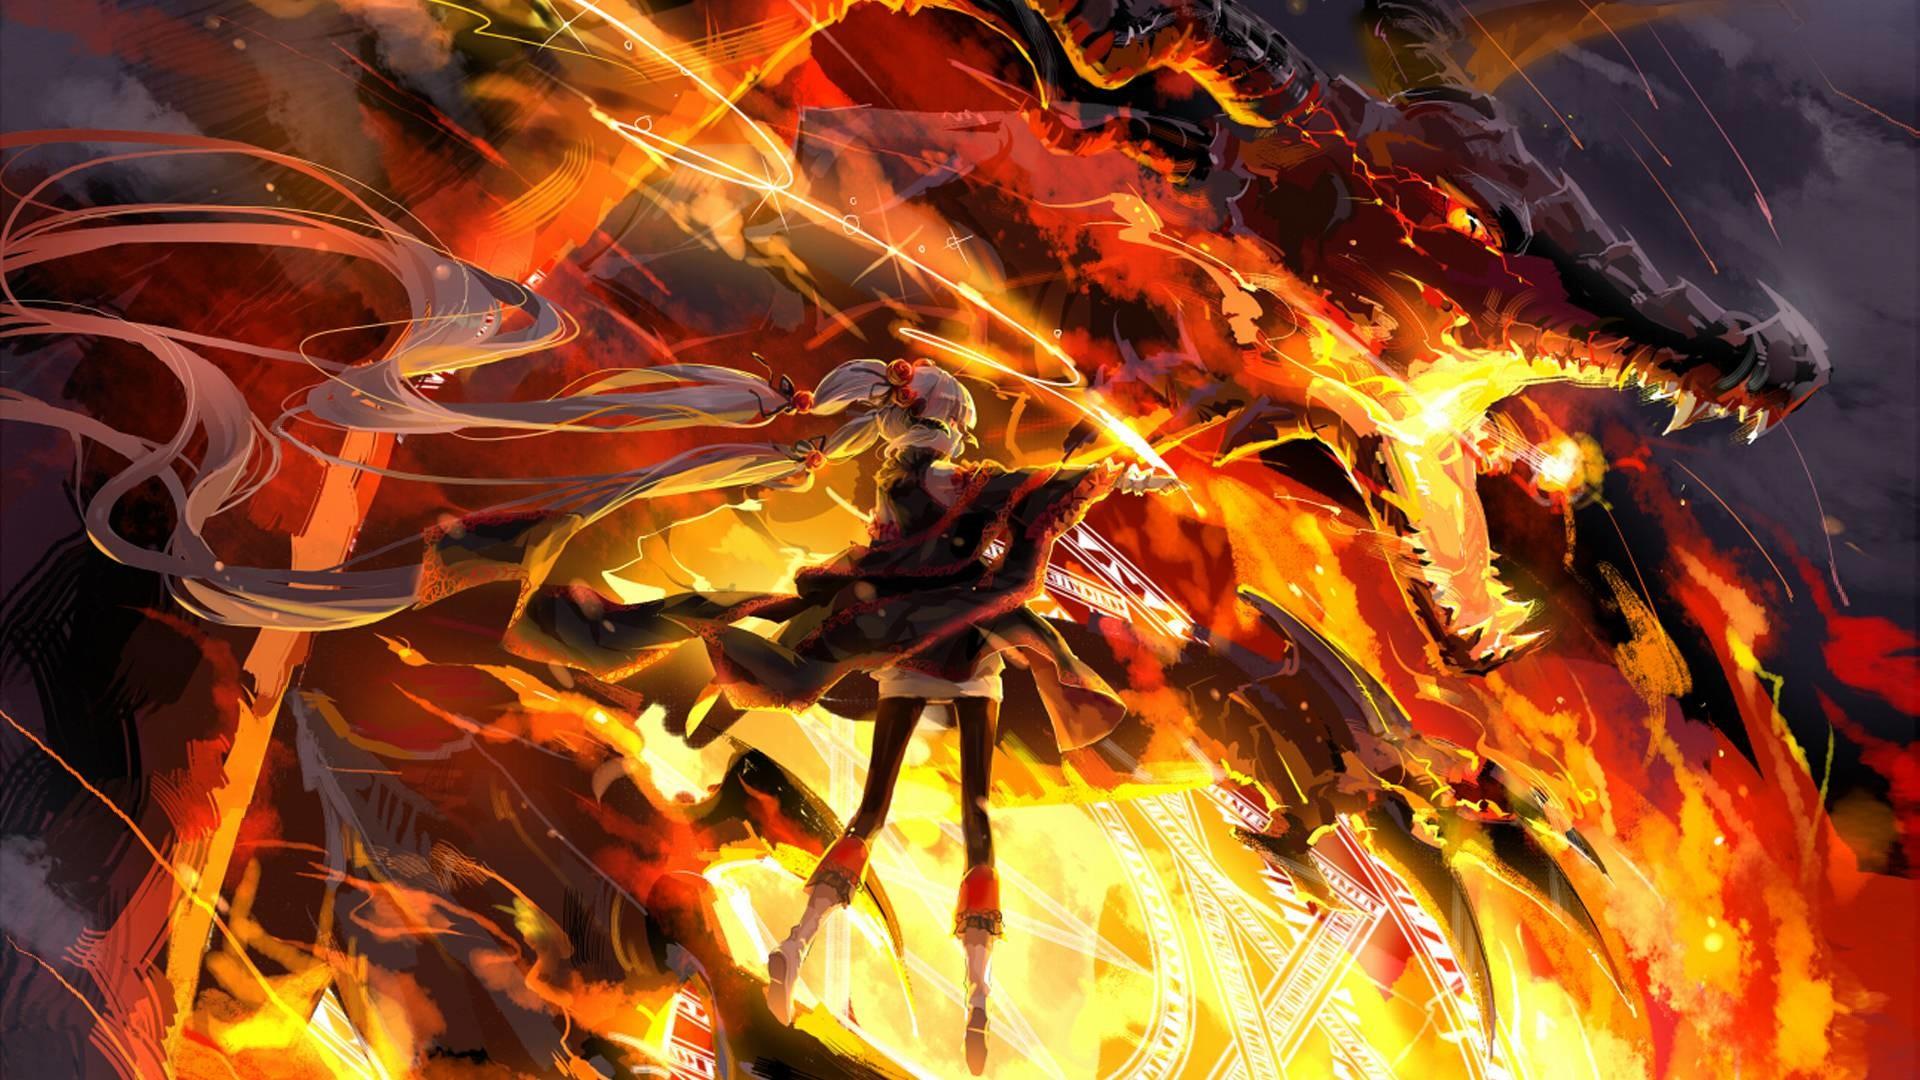 Girl Anime Wallpaper Free Download Anime Dragon Wallpaper 67 Images